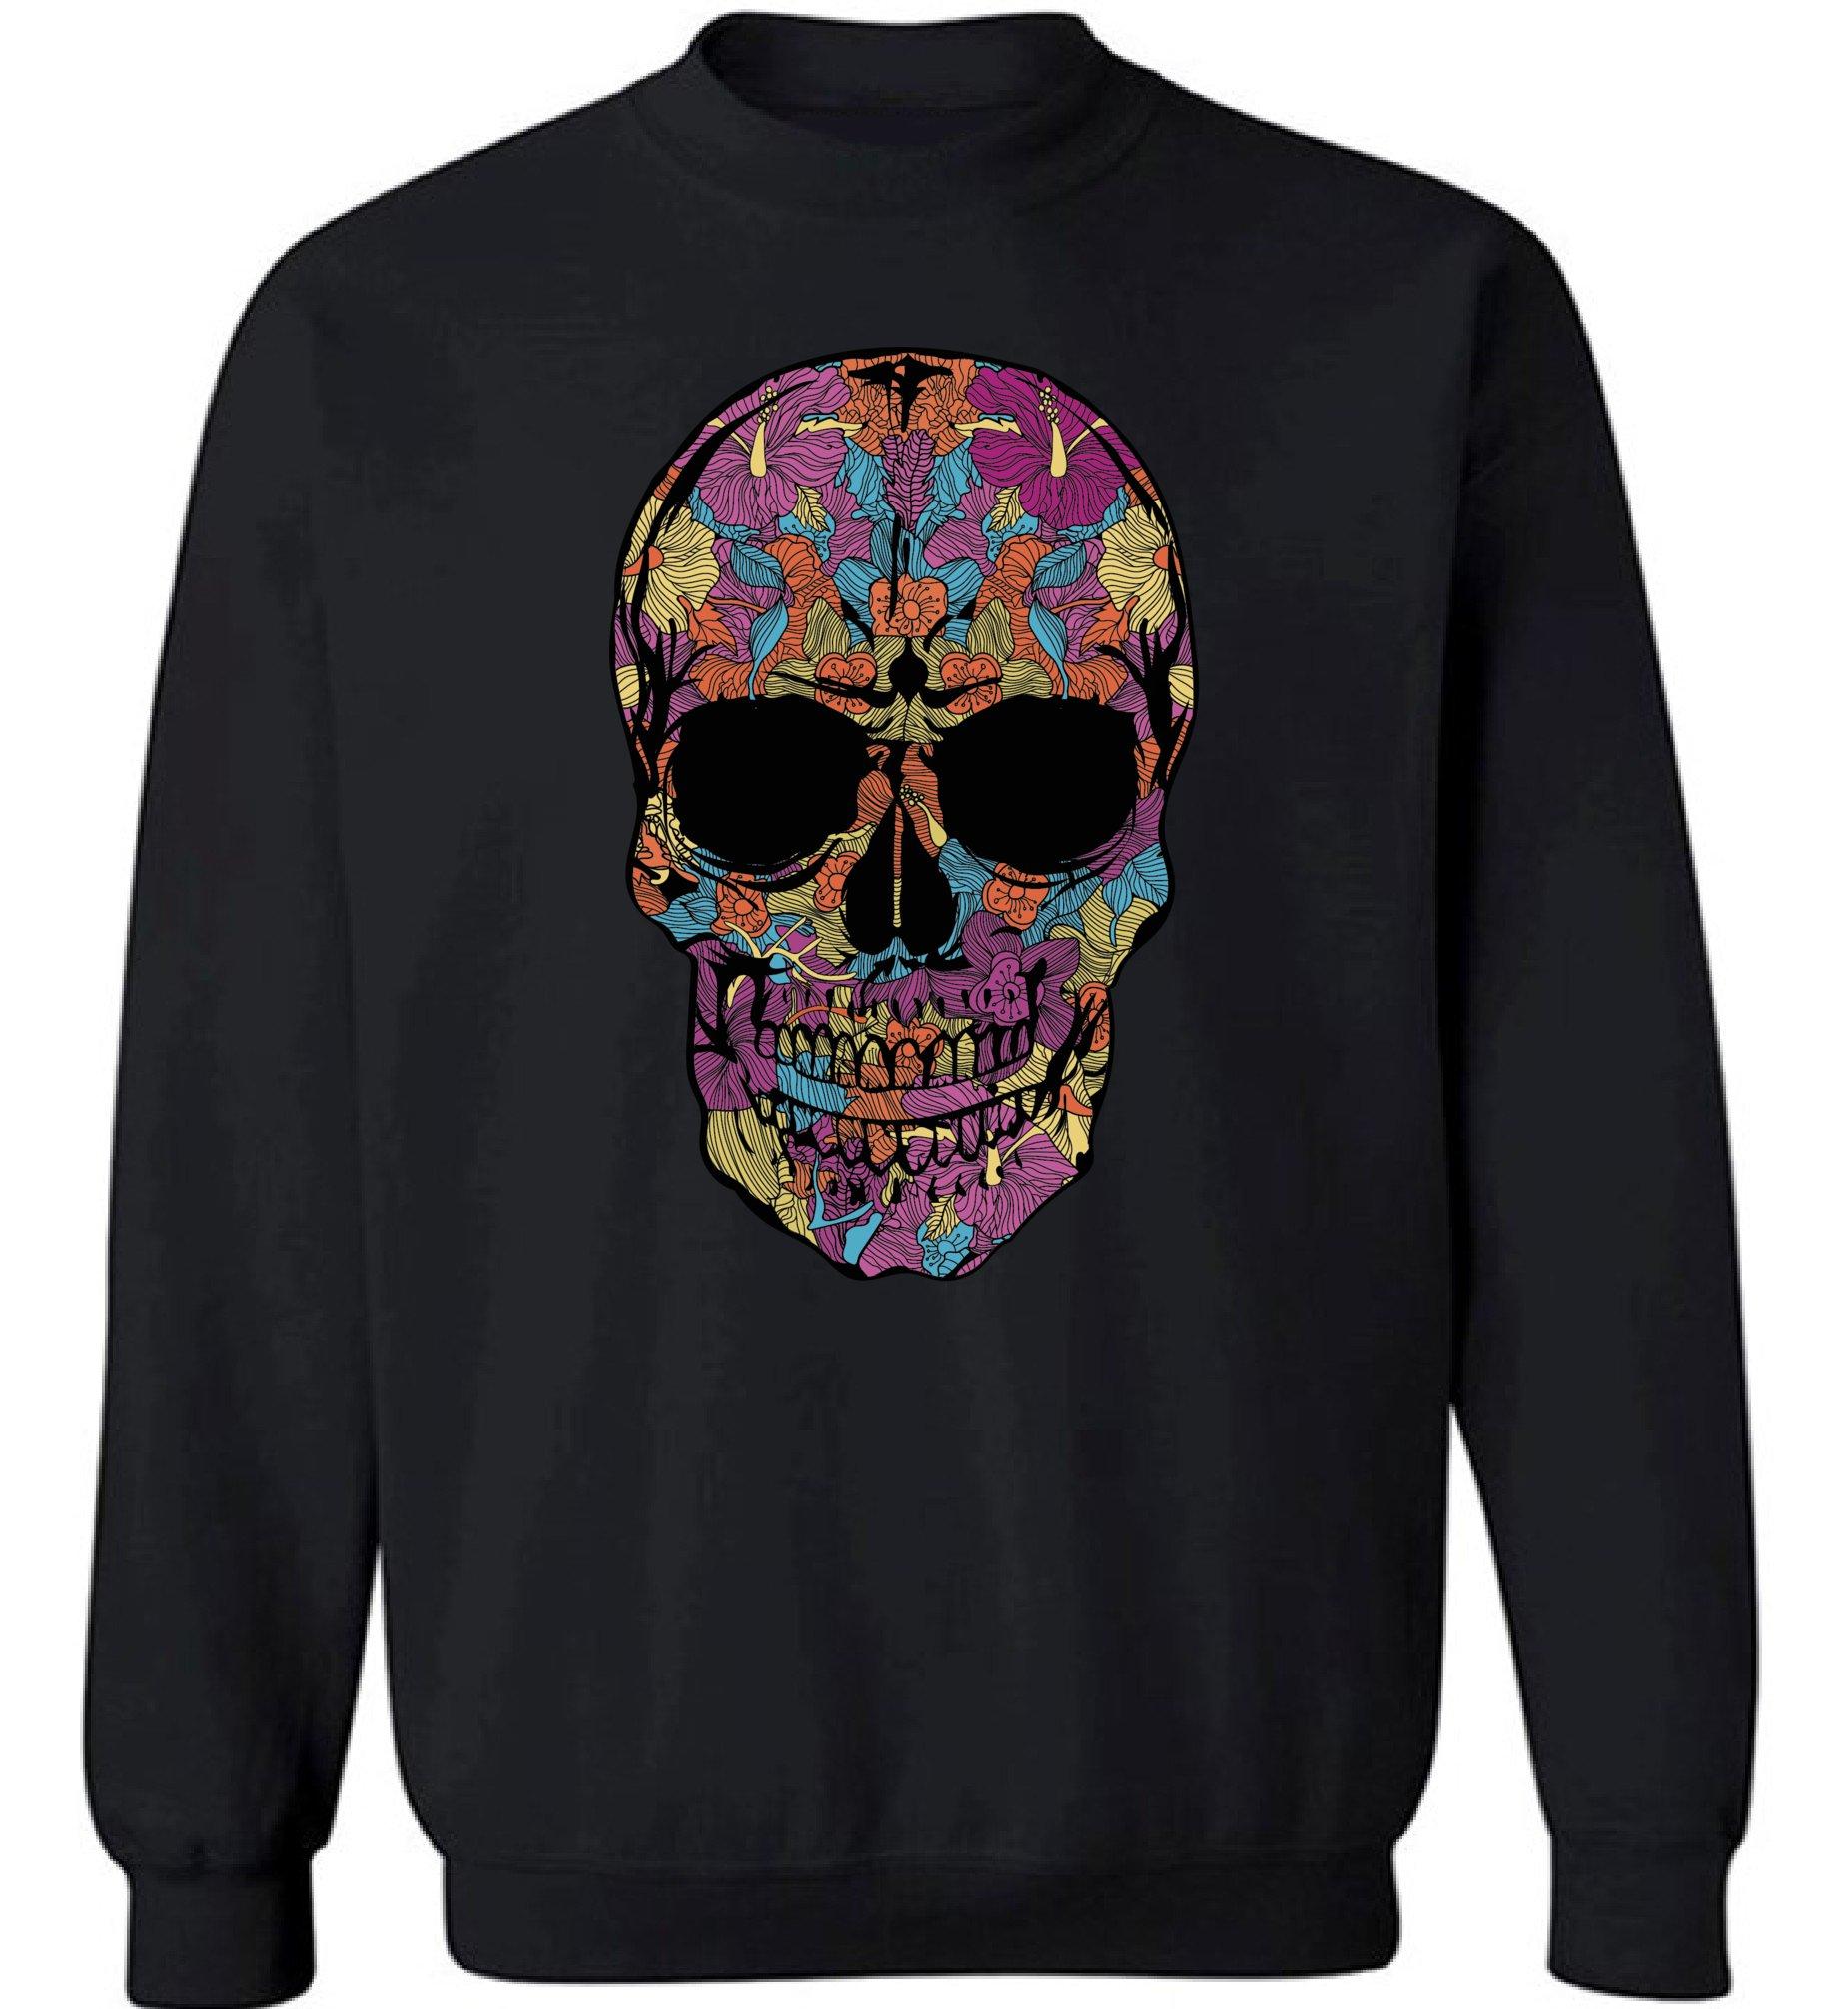 Pekatees Black Flower Skull Sweatshirt Sugar Skull Sweater Day of The Dead Gifts Black 3XL